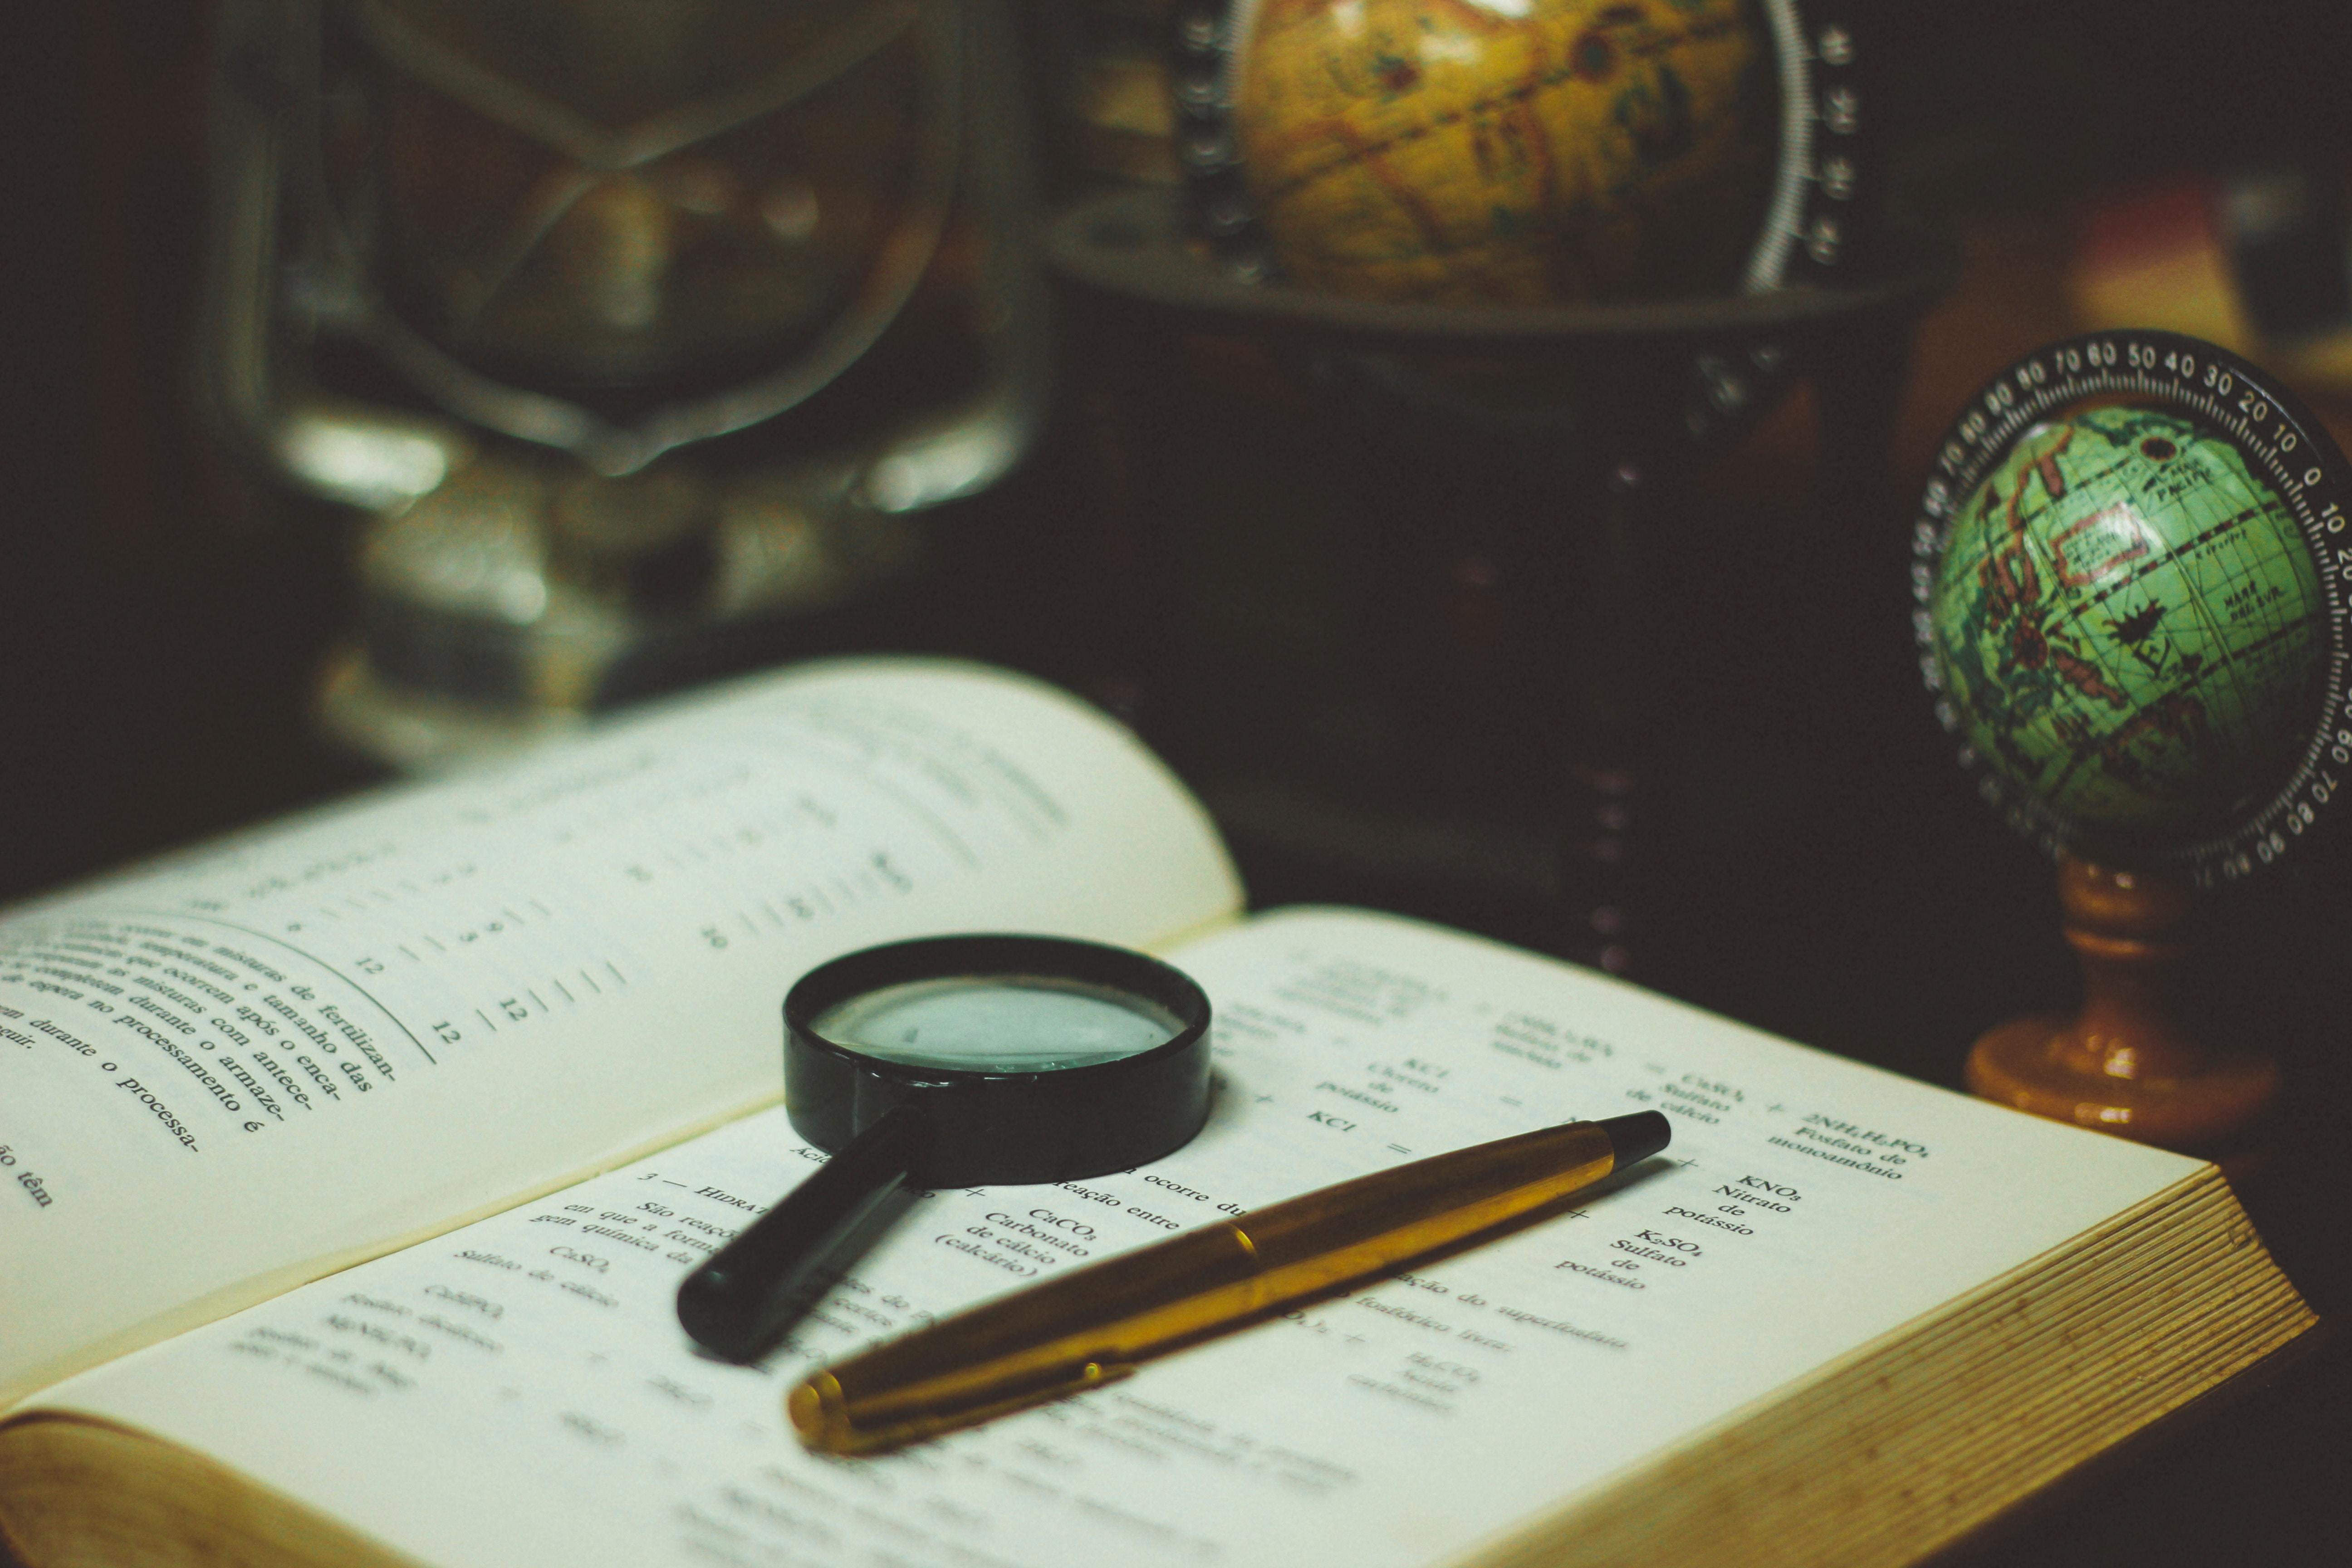 Book Map Globe Glass